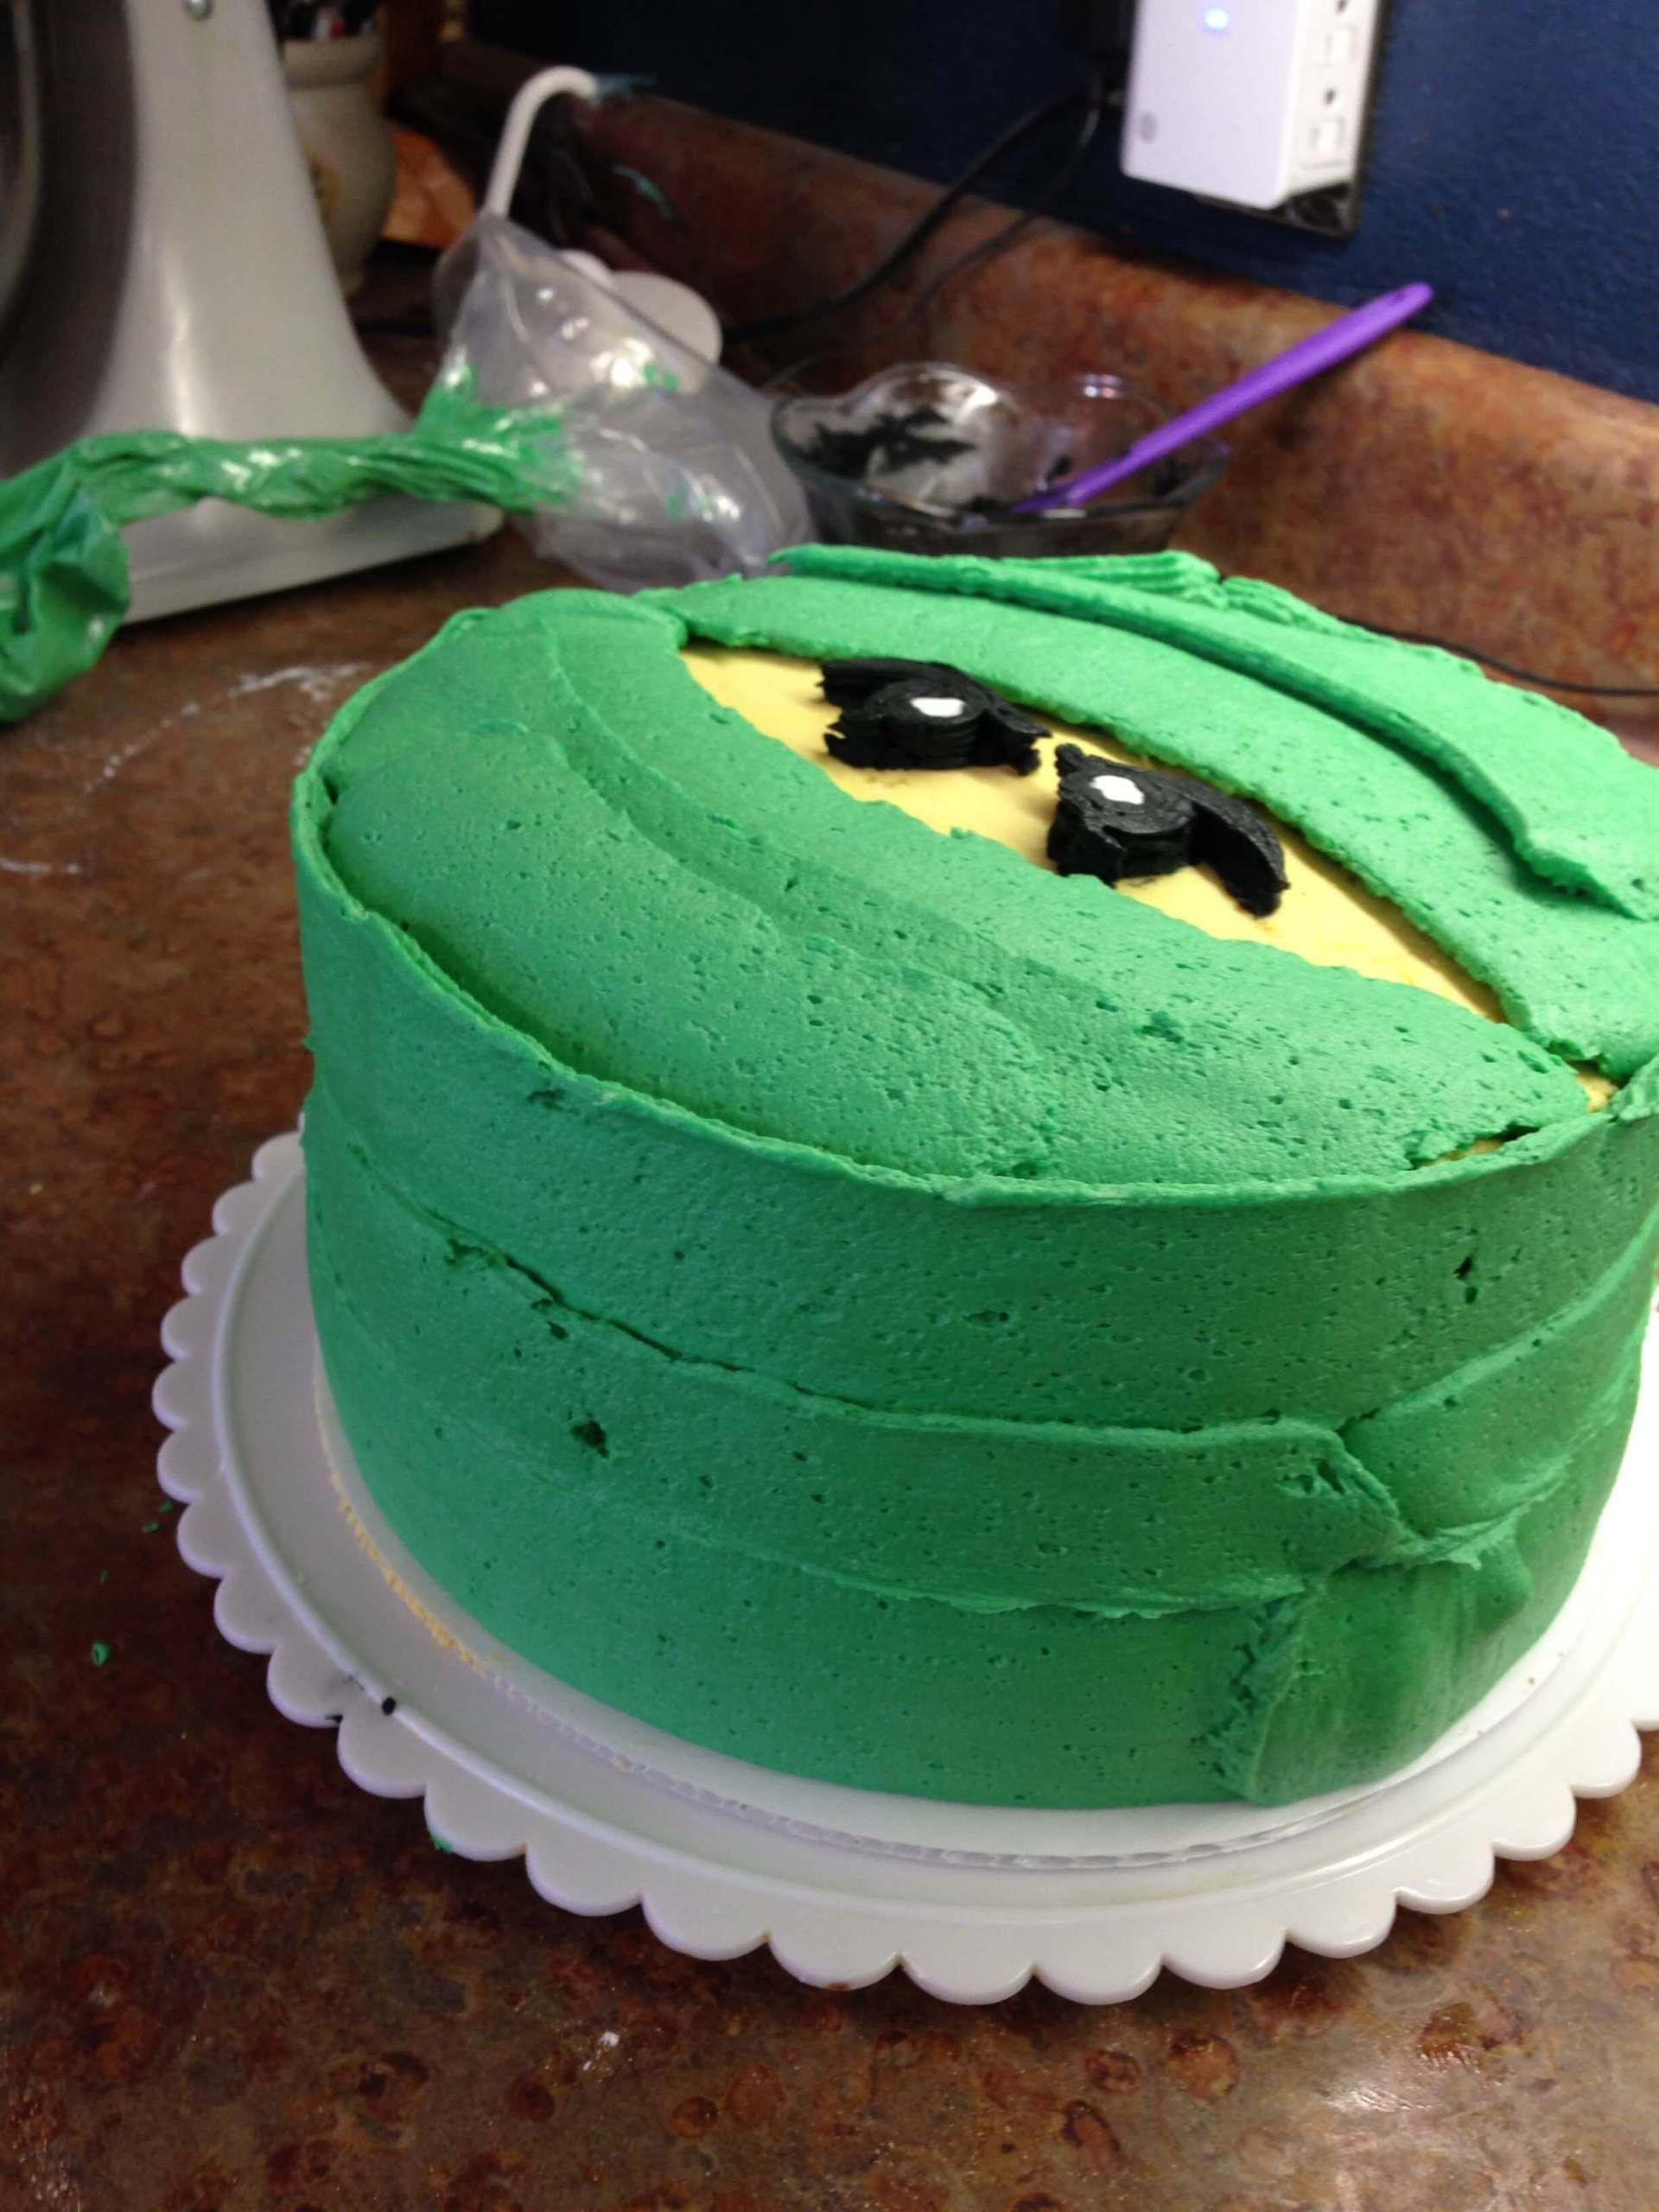 An Easy How-To for Making a Buttercream Ninjago Cake